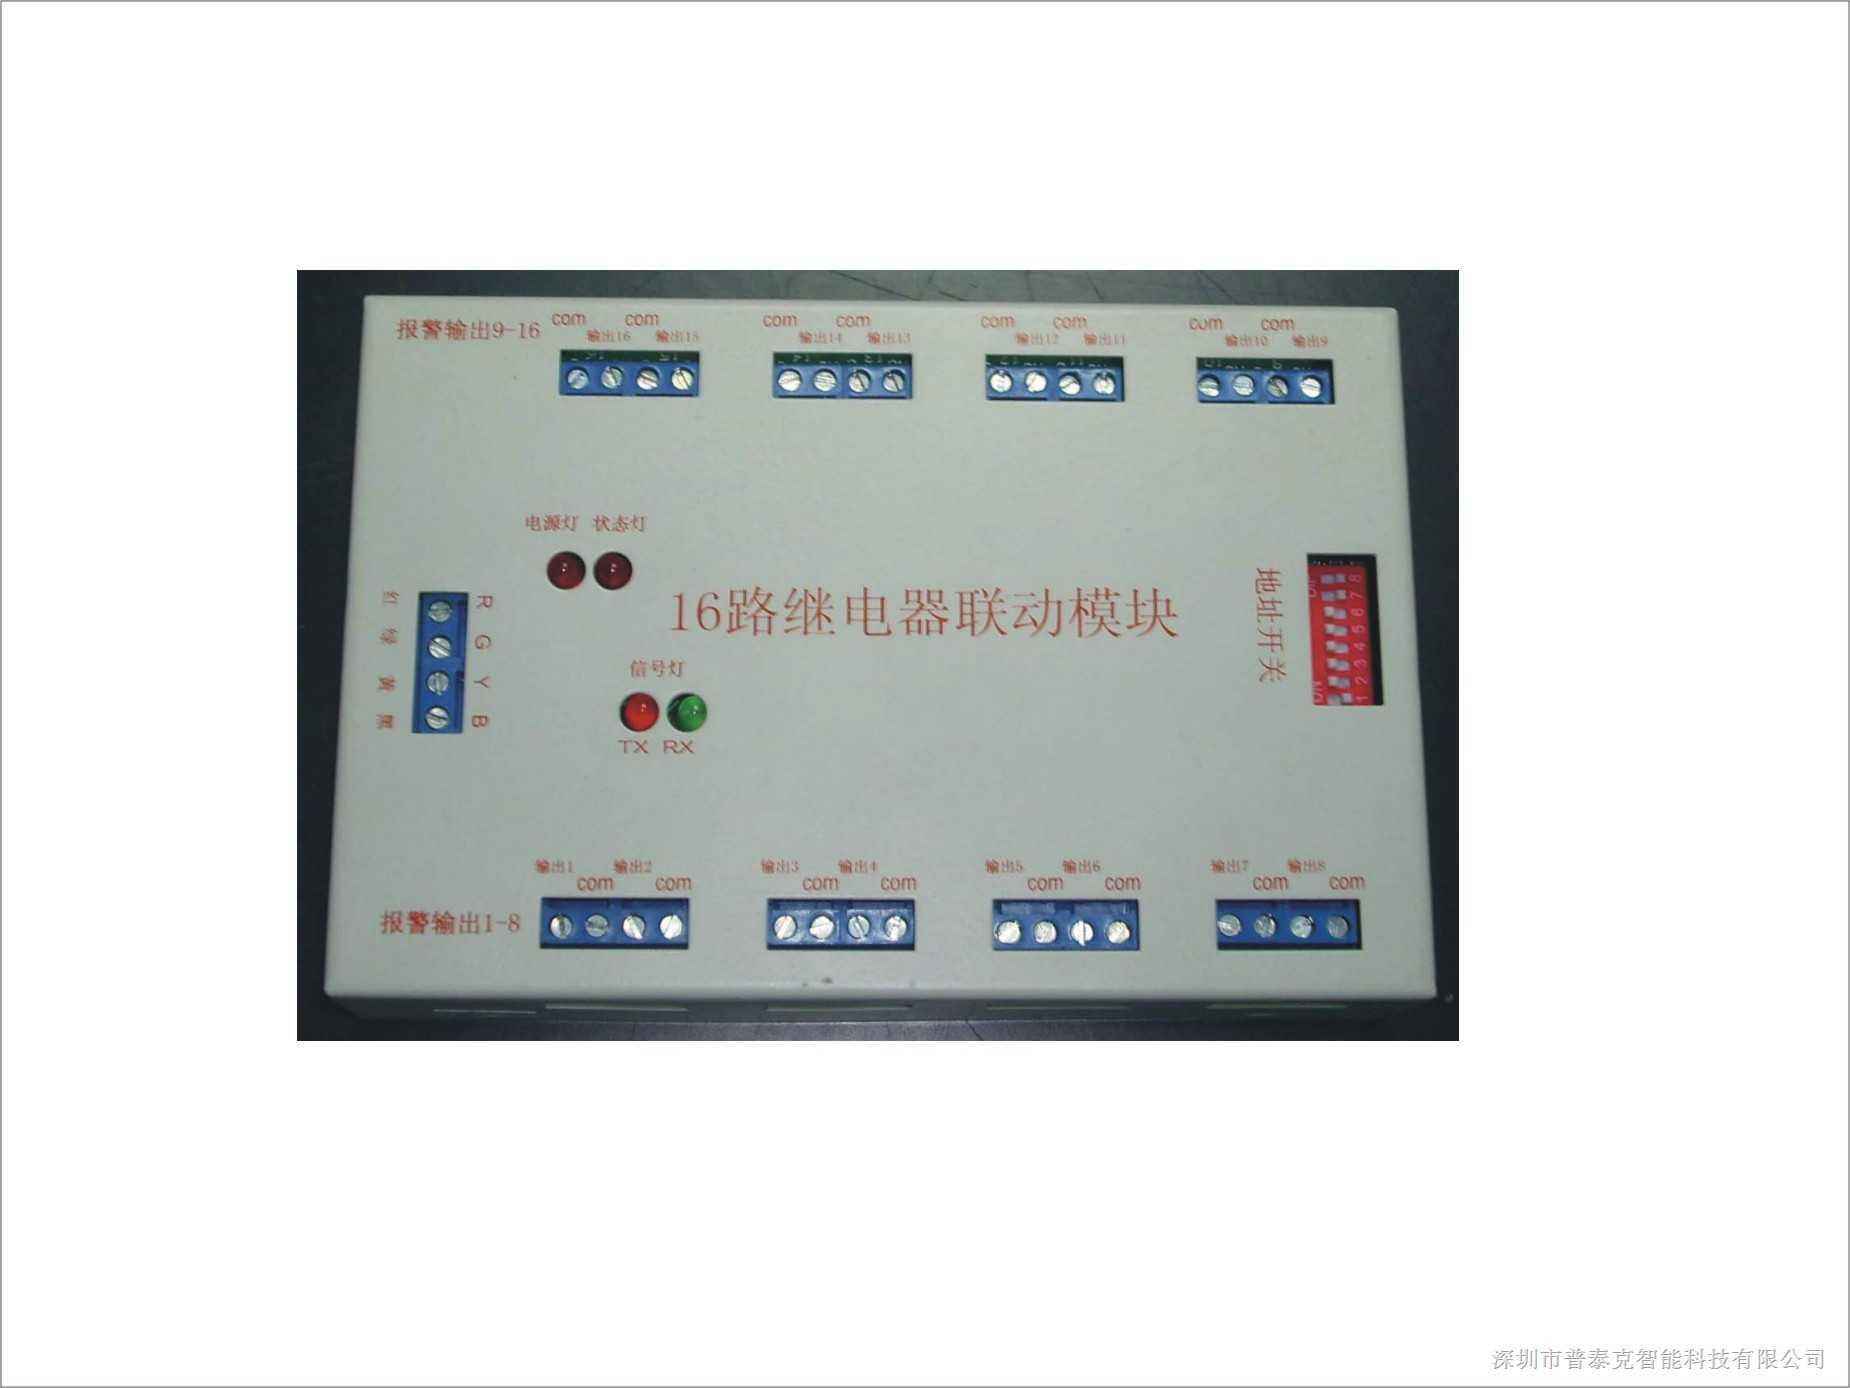 (PTK-16C) 16路继电器联动模块